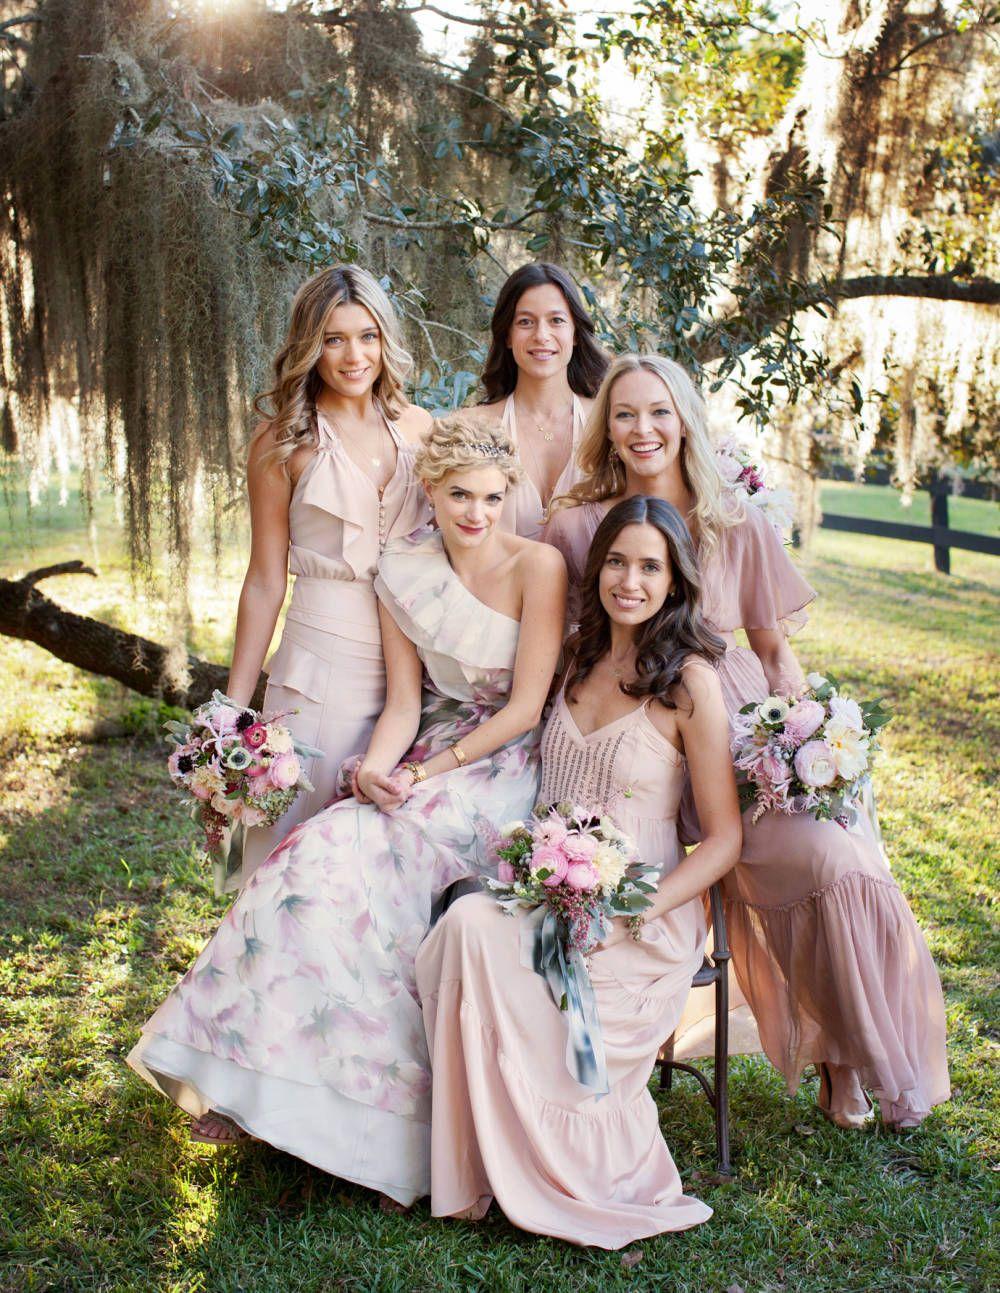 Best dress to wear to a garden wedding  The  Best Dresses to Wear to a Summer Wedding  Wedding guest